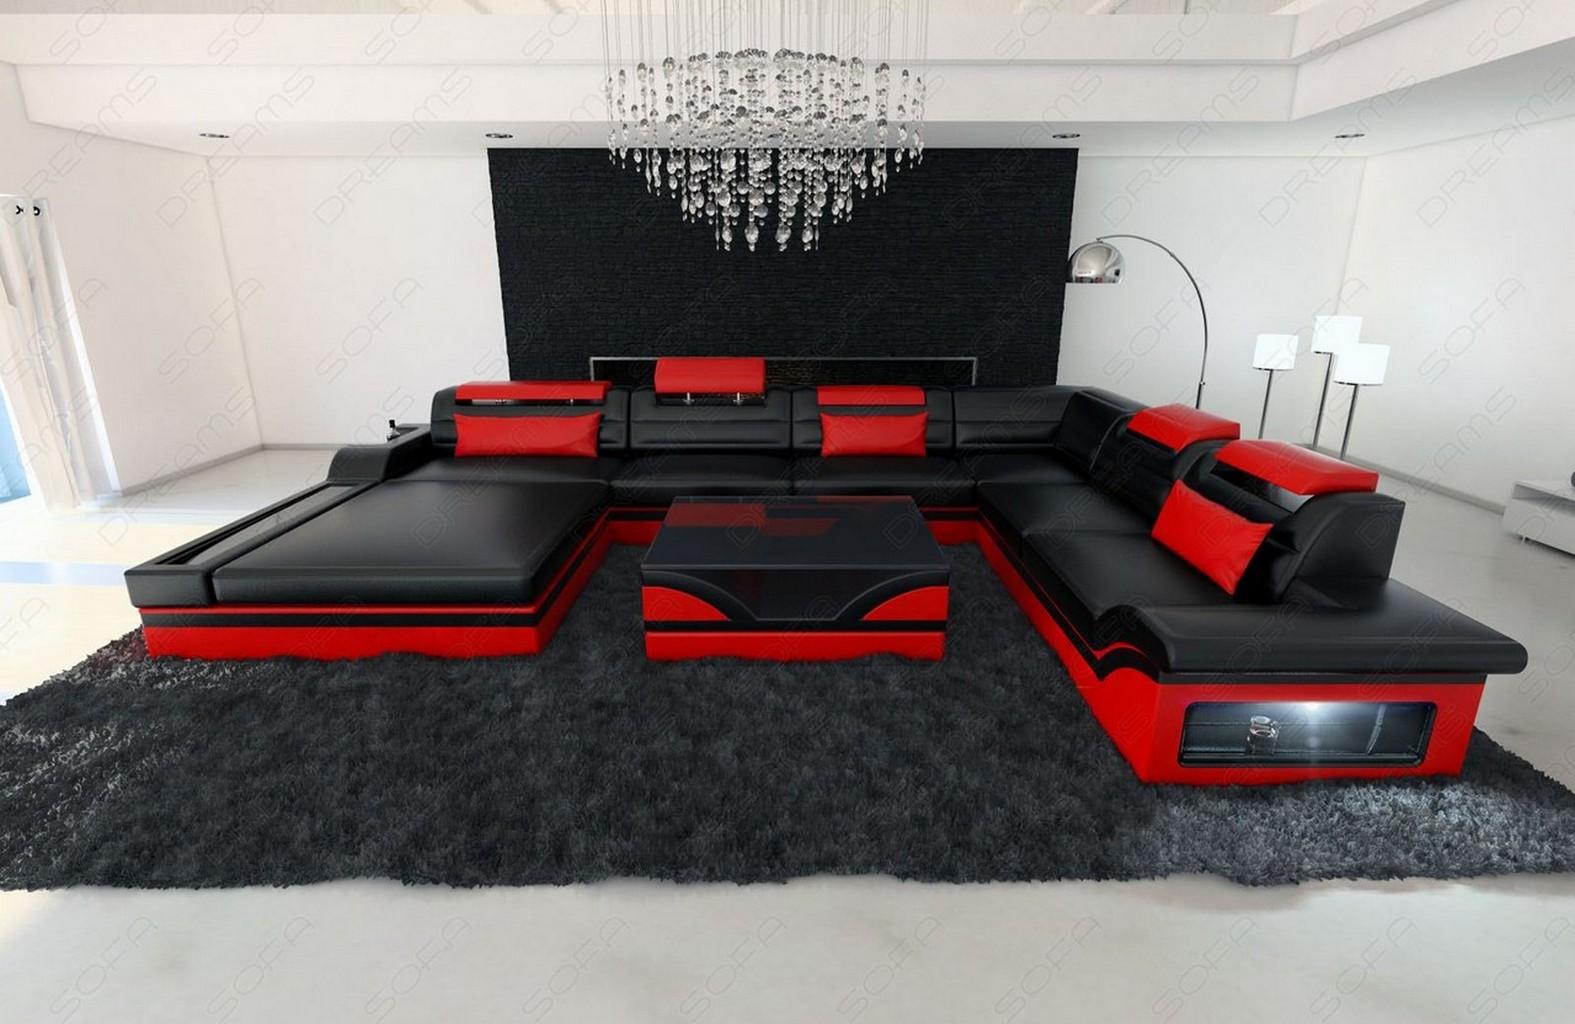 Ledersofa designklassiker  XXL WOHNLANDSCHAFT MEZZO LED DESIGNER COUCH GARNITUR LEDERSOFA +++ ...